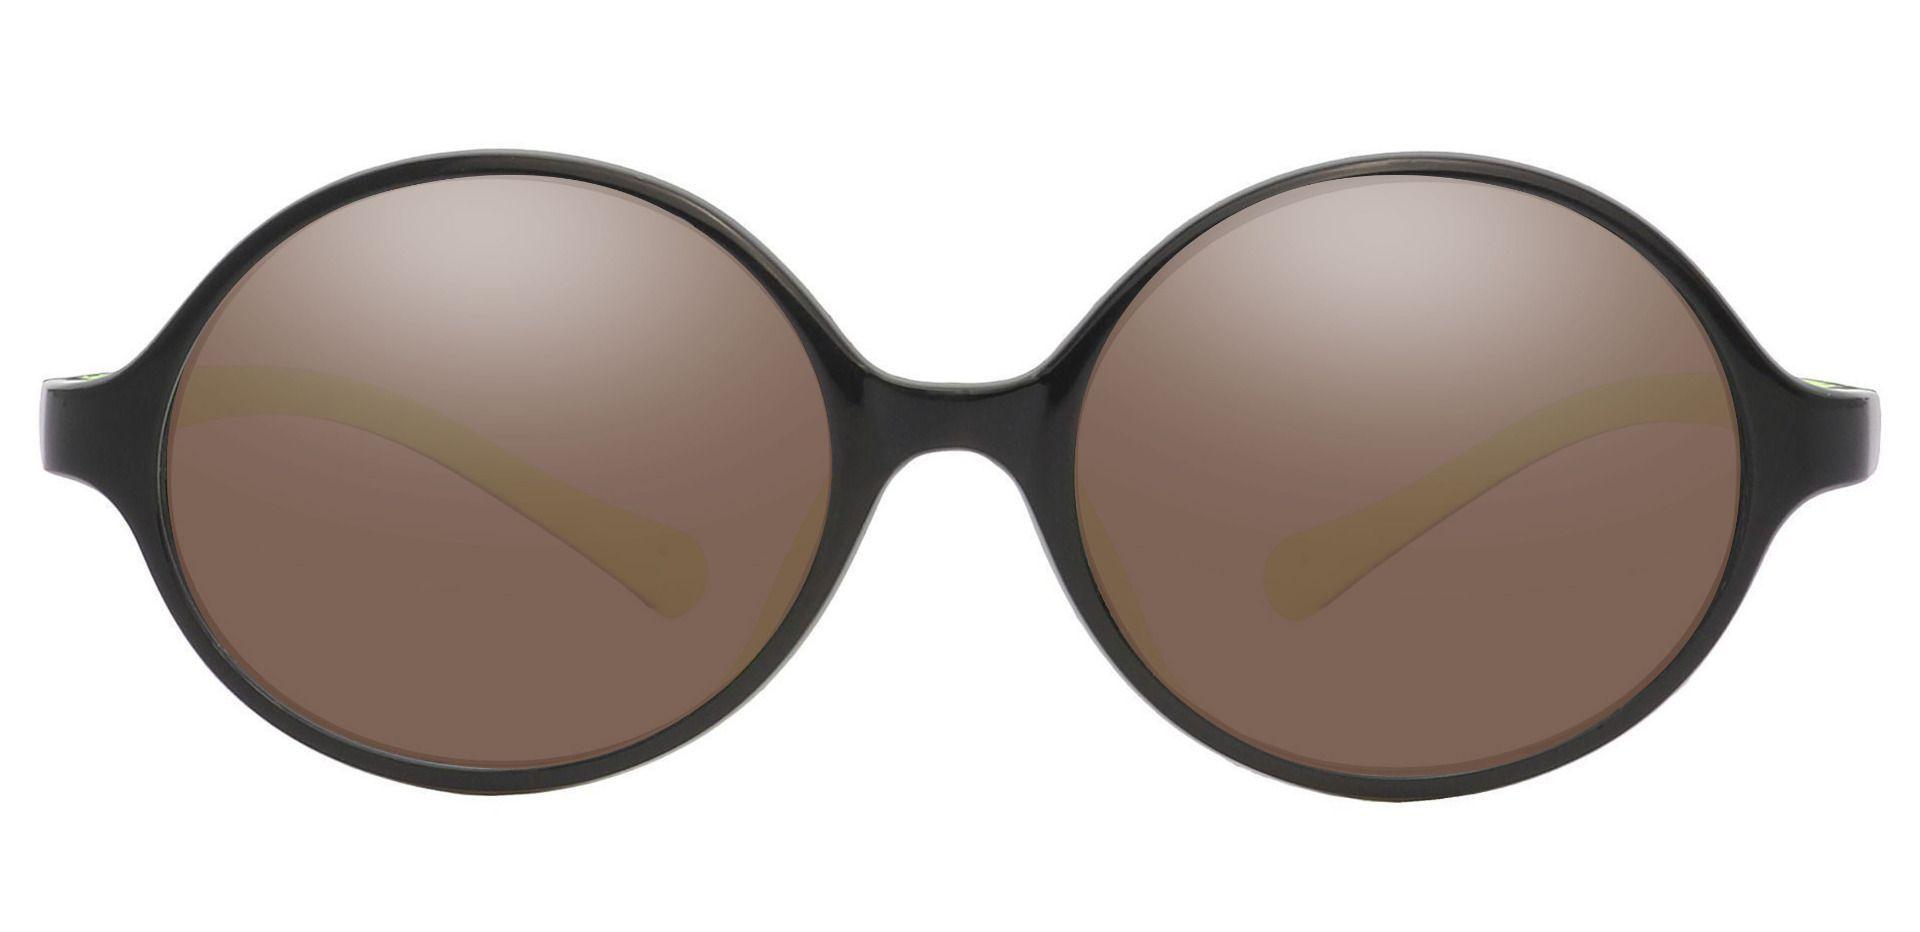 Dagwood Round Prescription Sunglasses - Black Frame With Brown Lenses